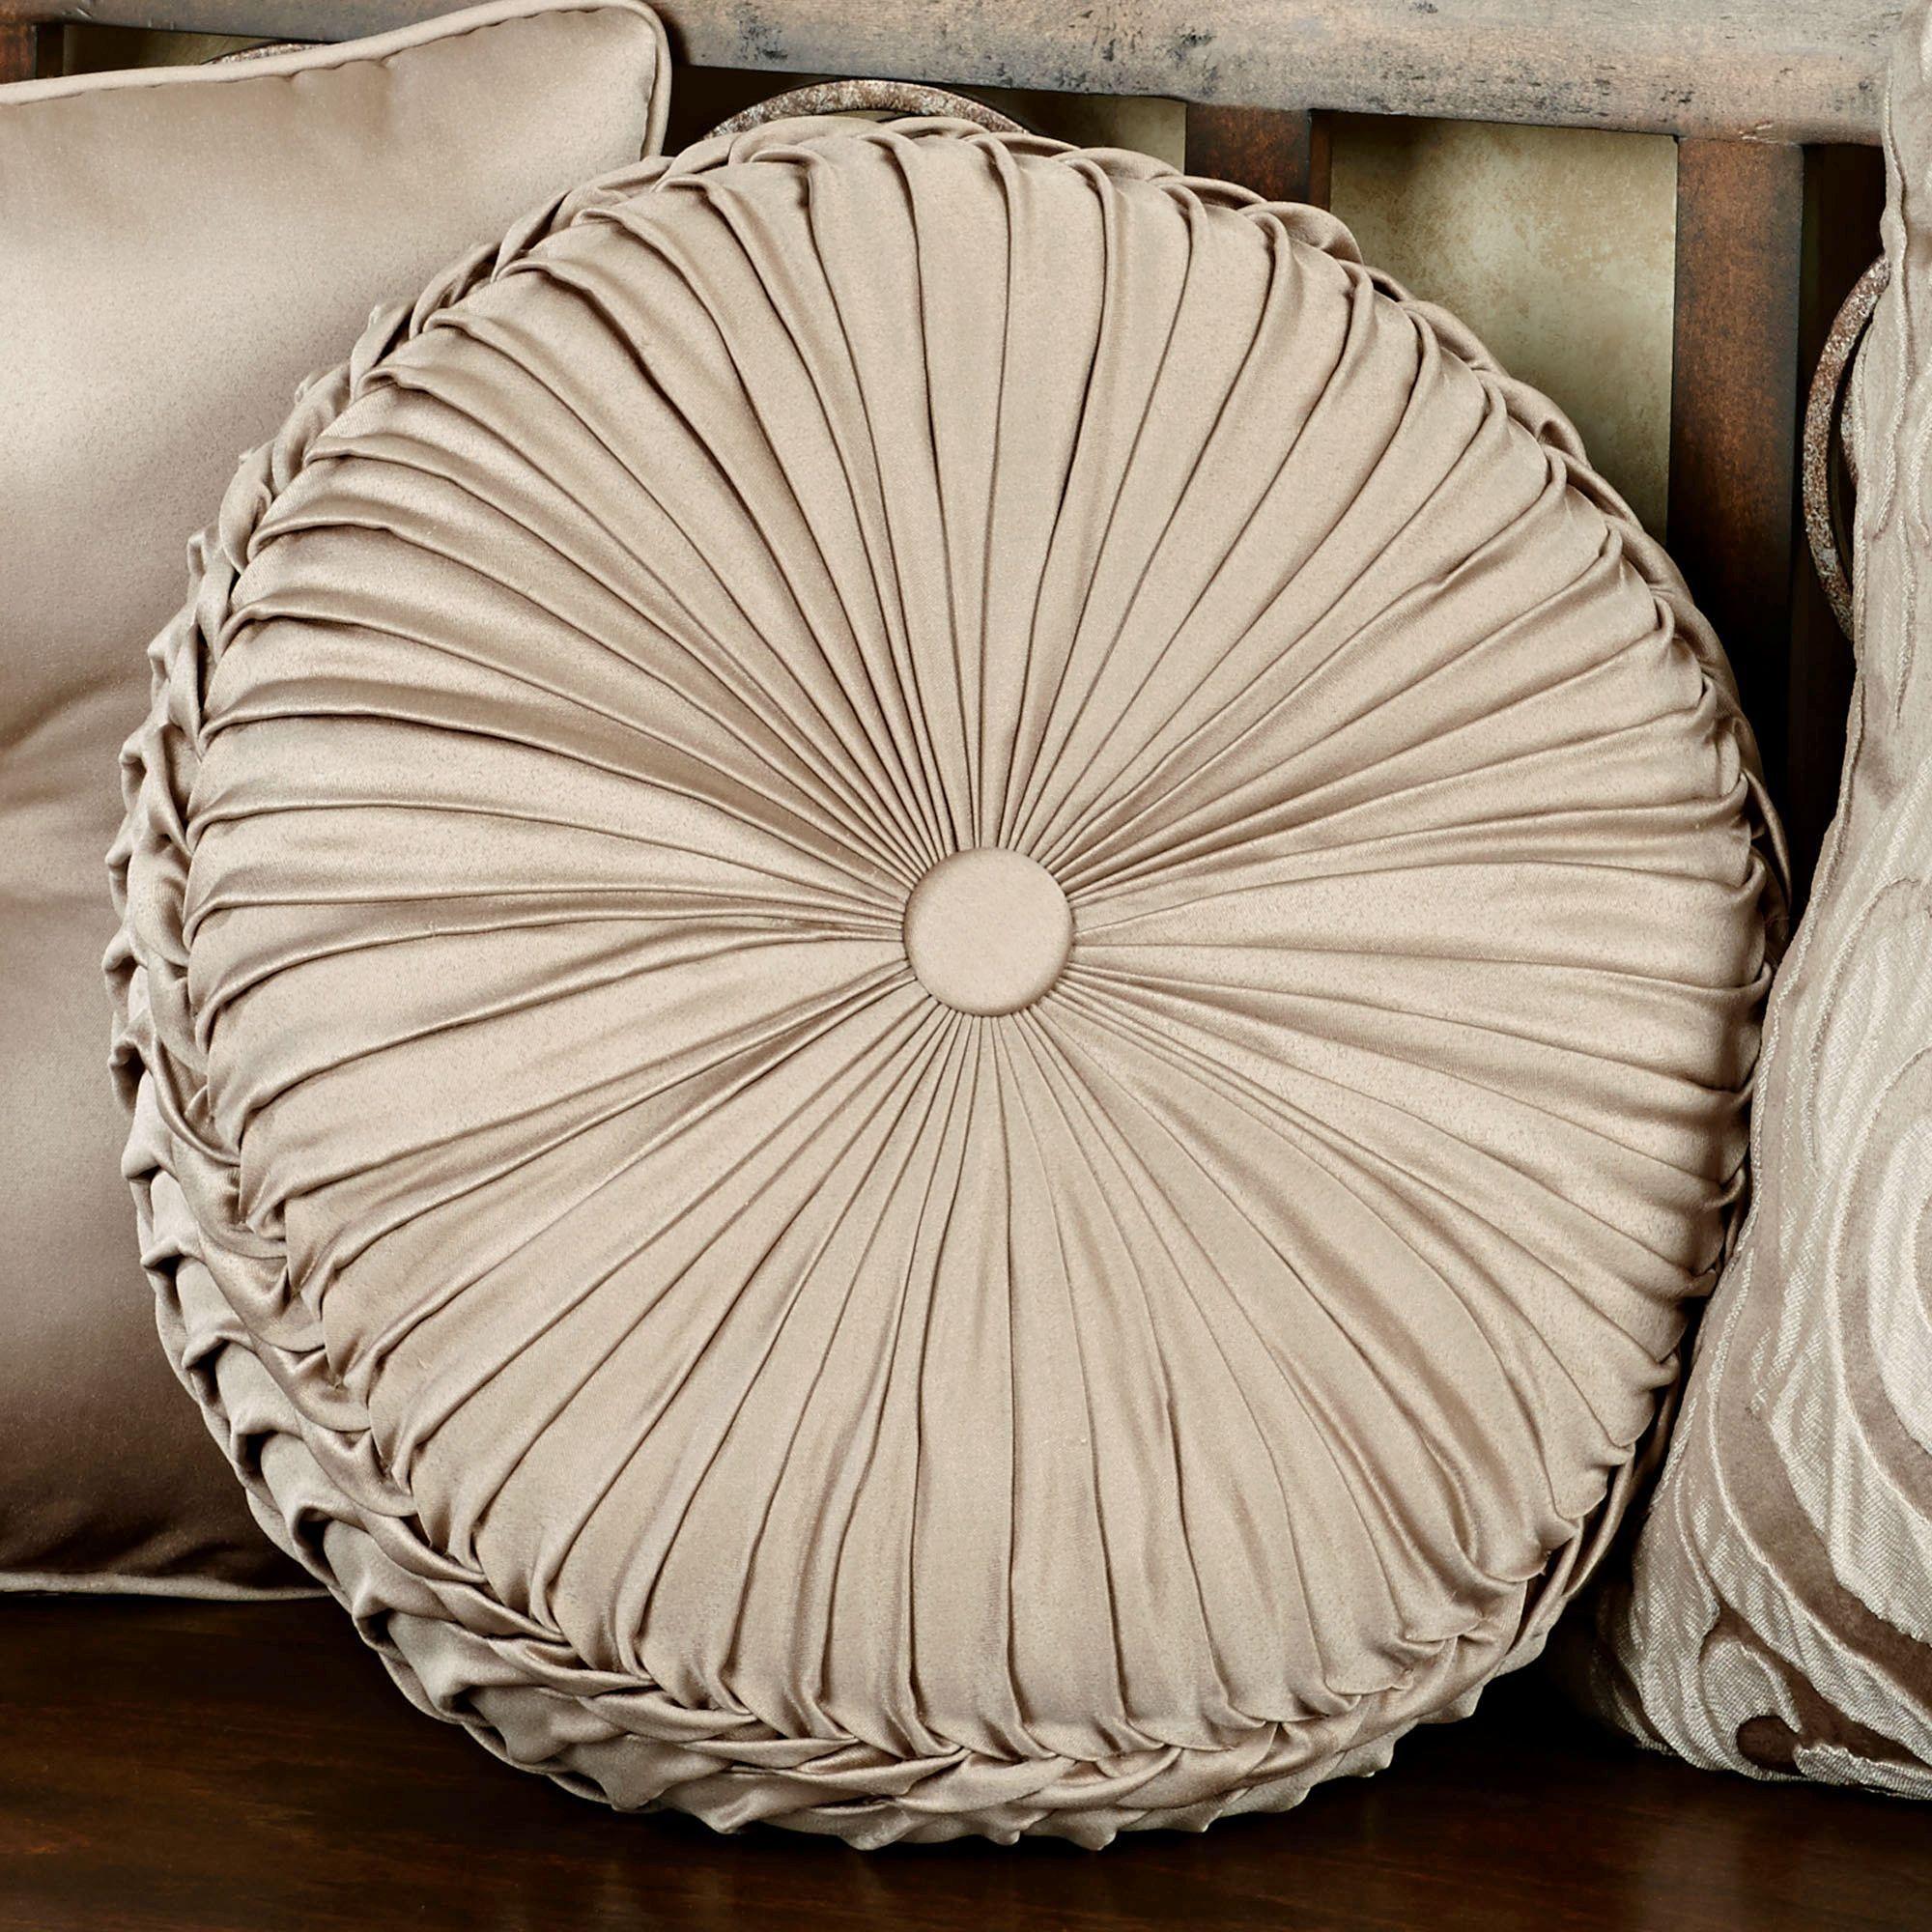 Astoria Scroll Decorative Pillows by J Queen New York